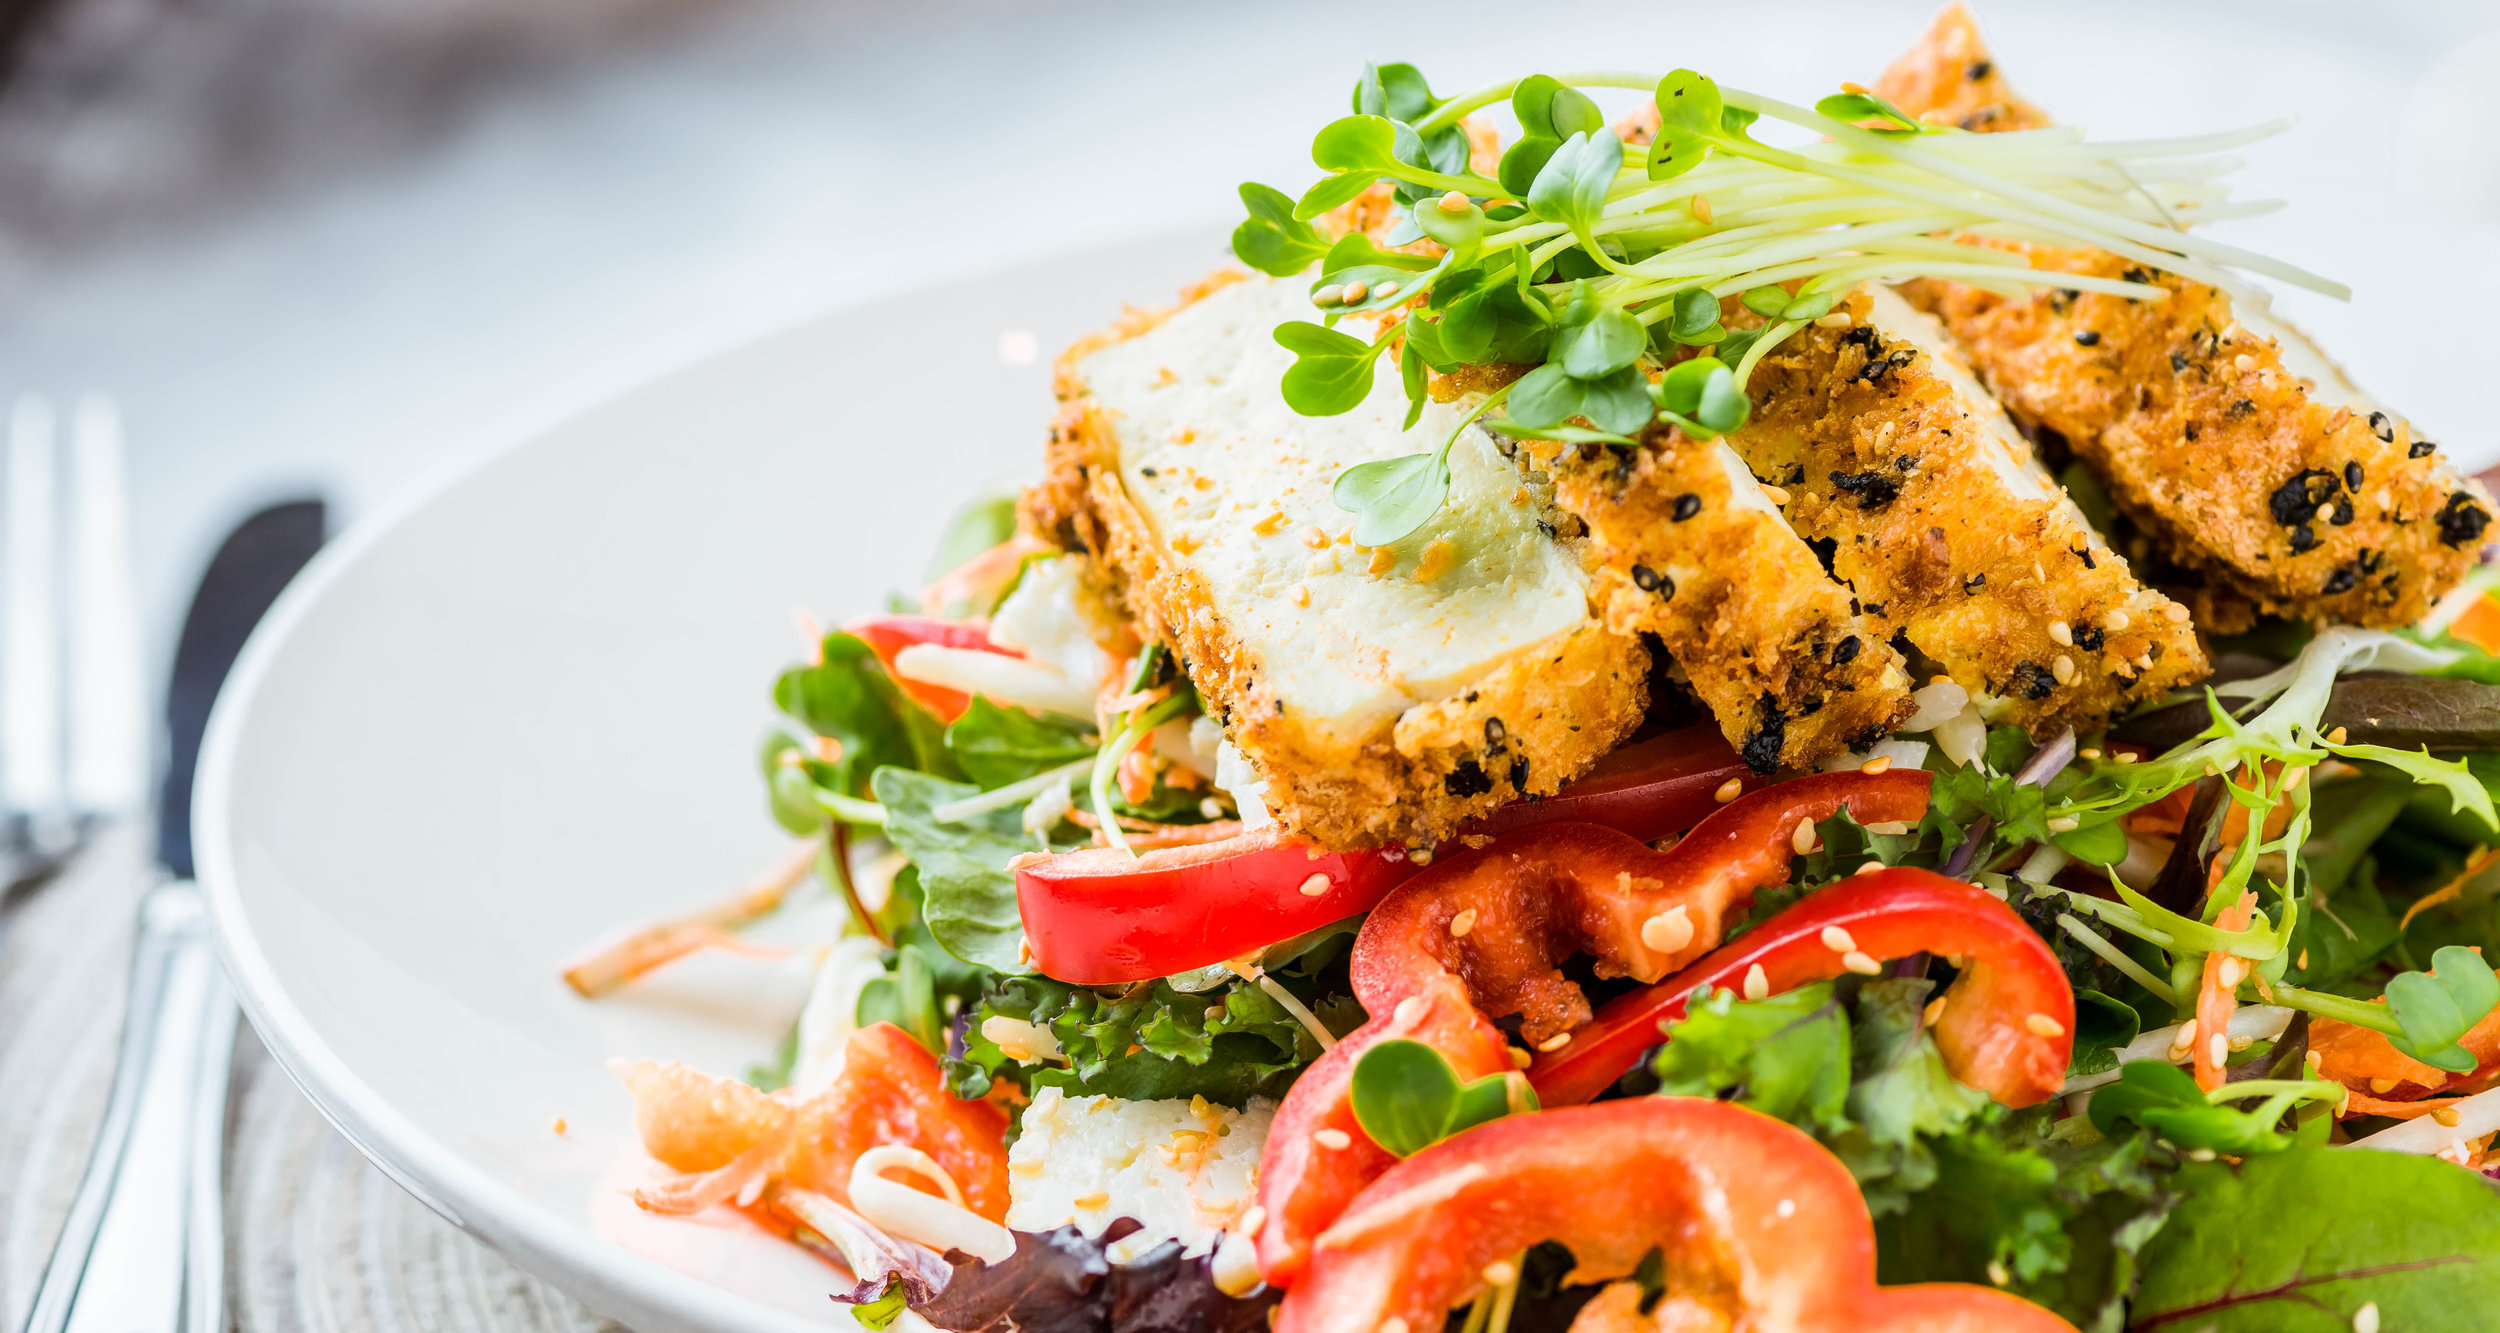 Vegan-Sprout Cafe-Tofu Salad-0728.jpg